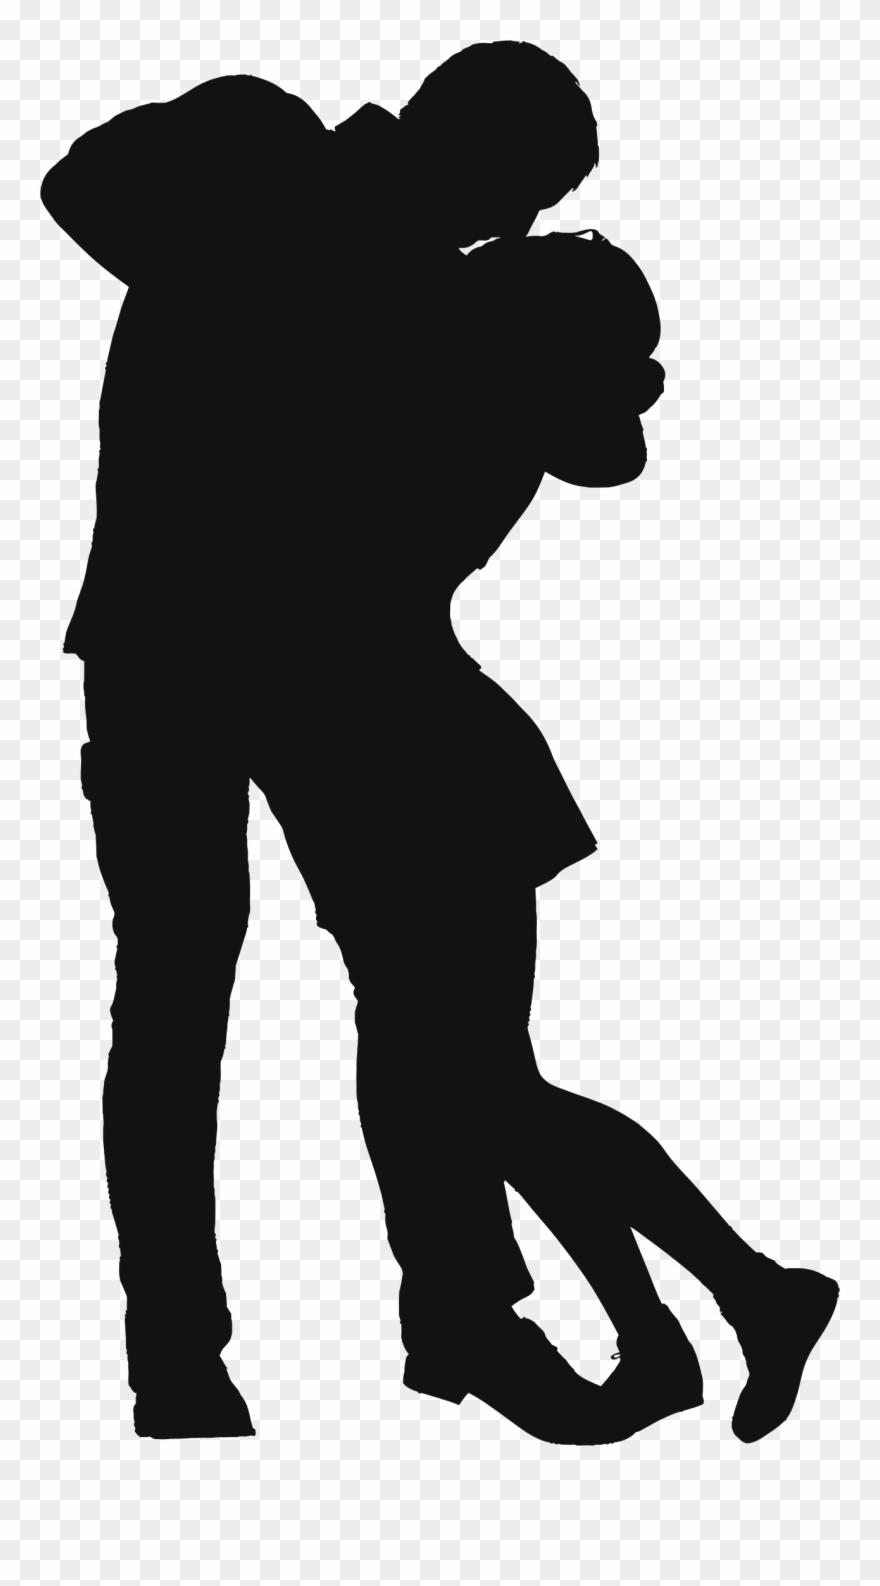 Pareja clipart jpg free stock Couple Silhouette Computer Icons Shadow Romance - Amor Romantico En ... jpg free stock